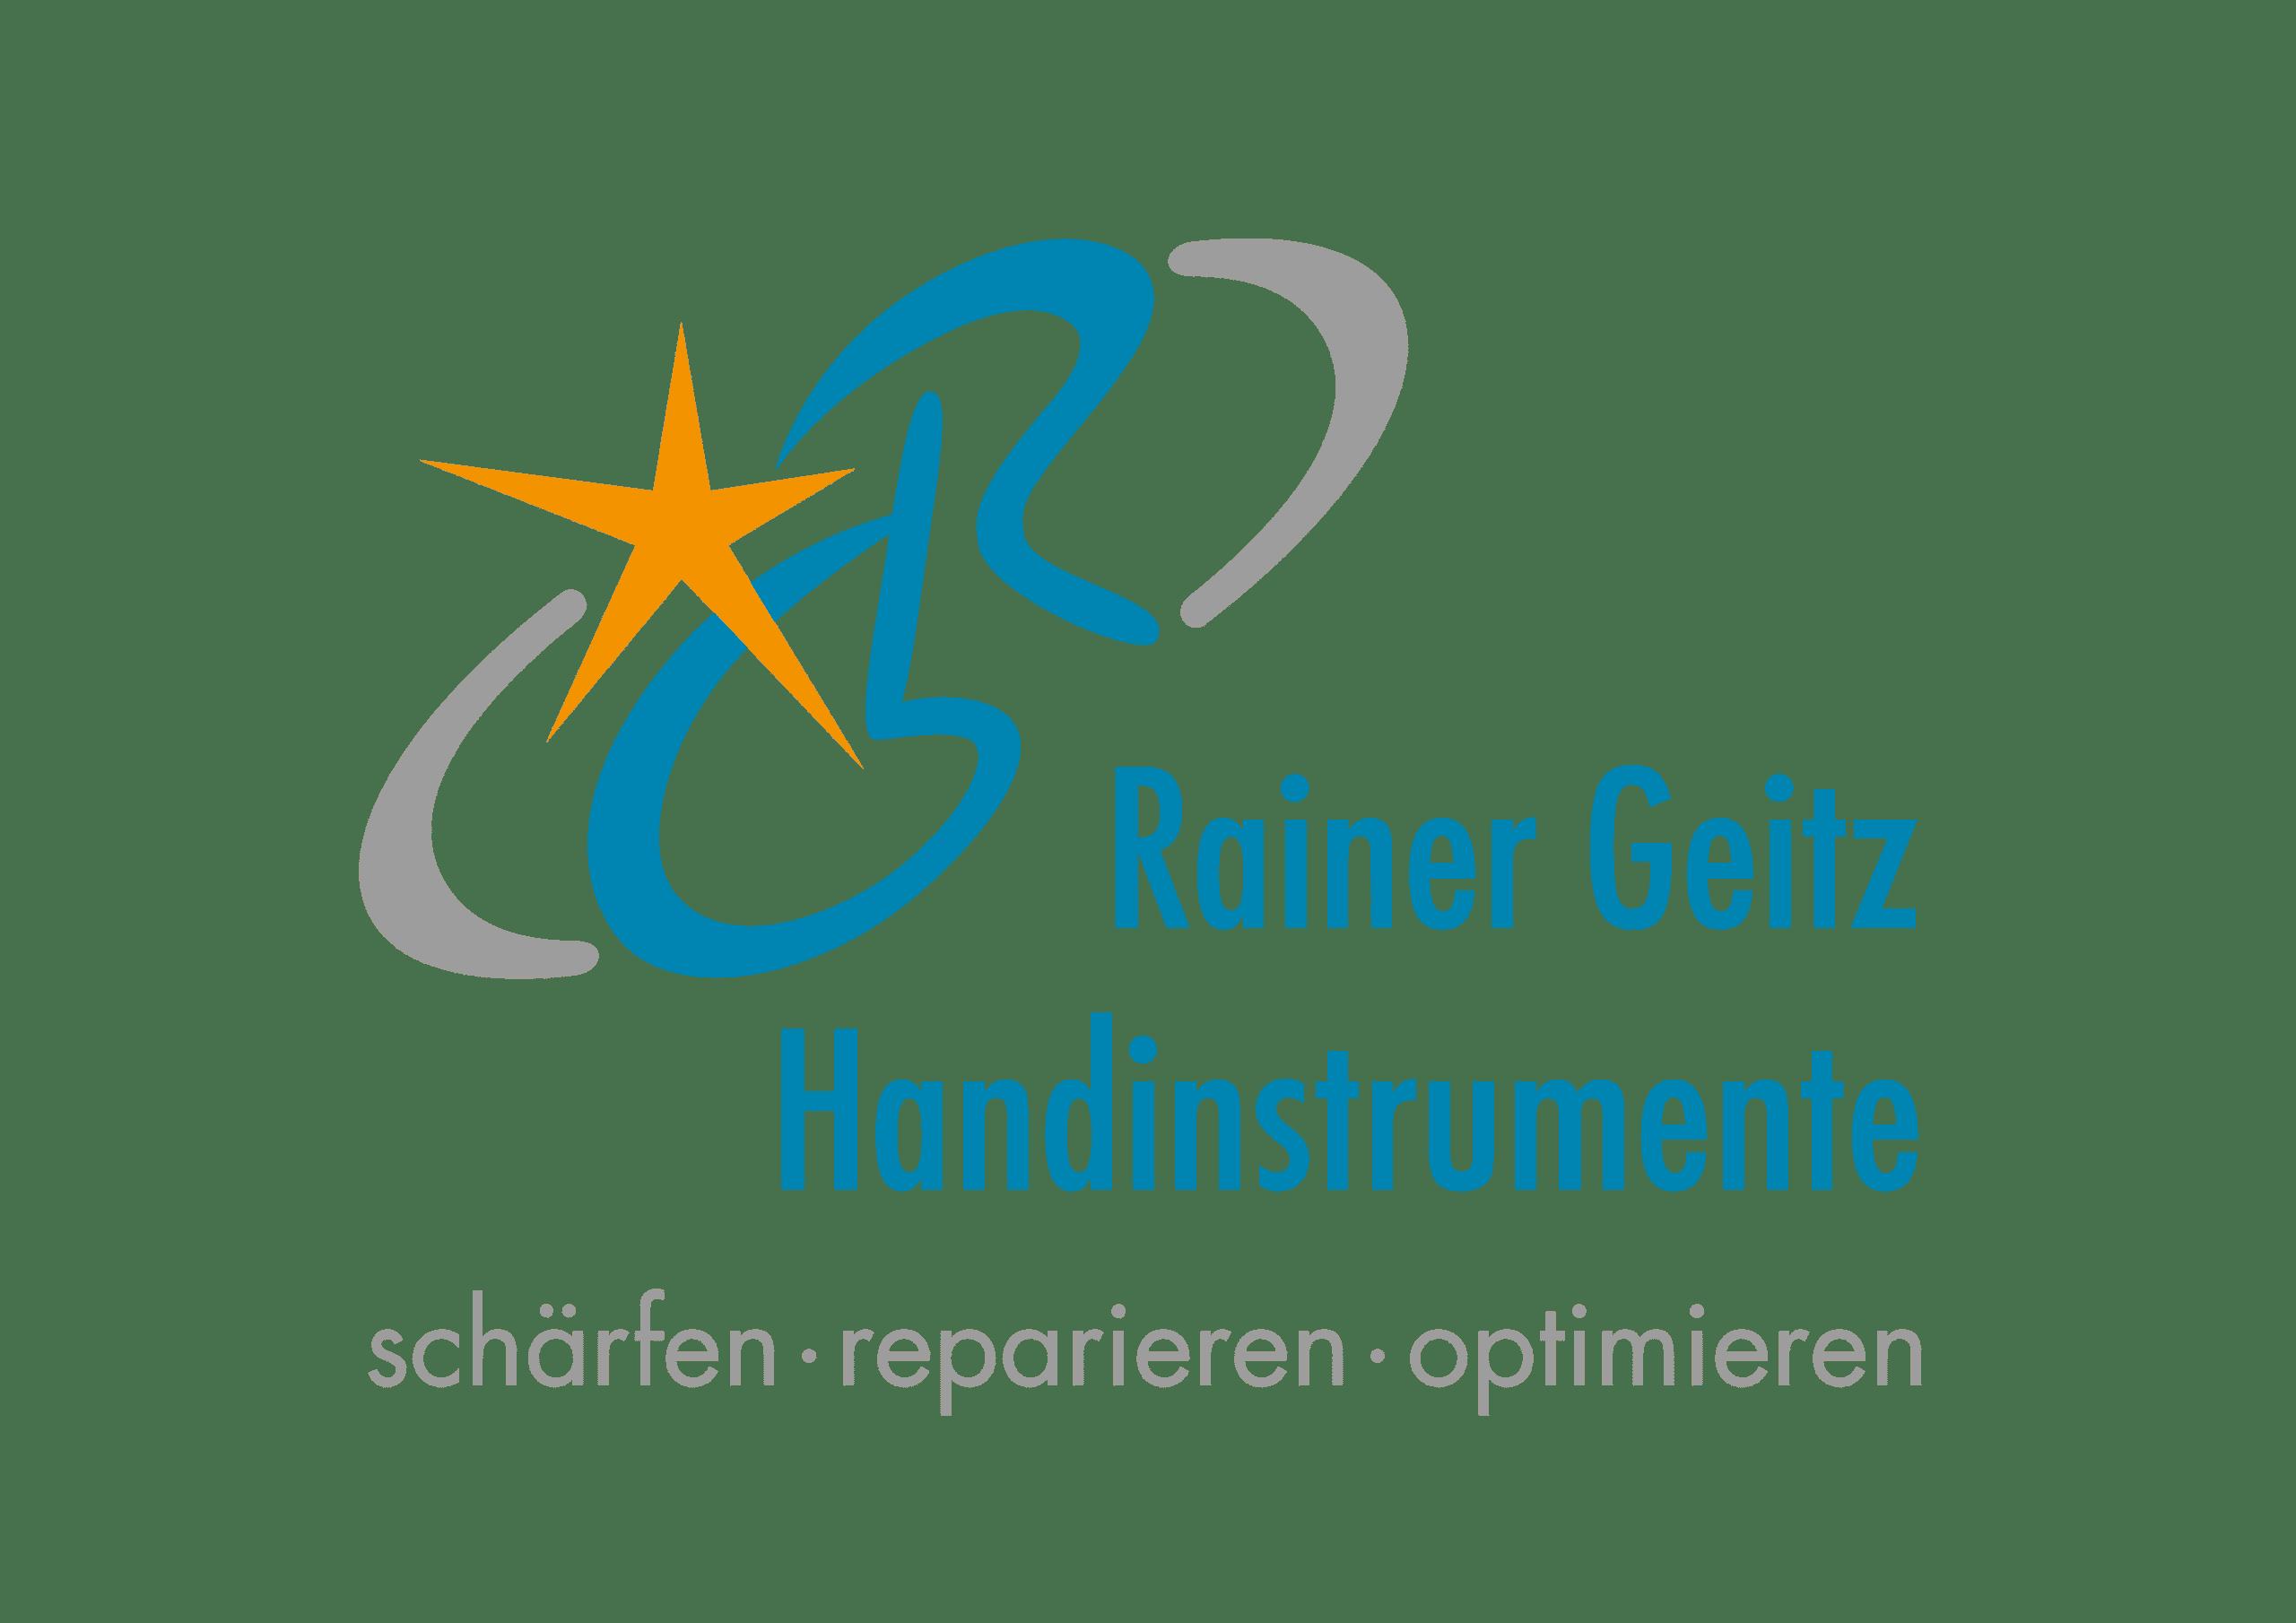 Rainer Geitz Handinstrumente